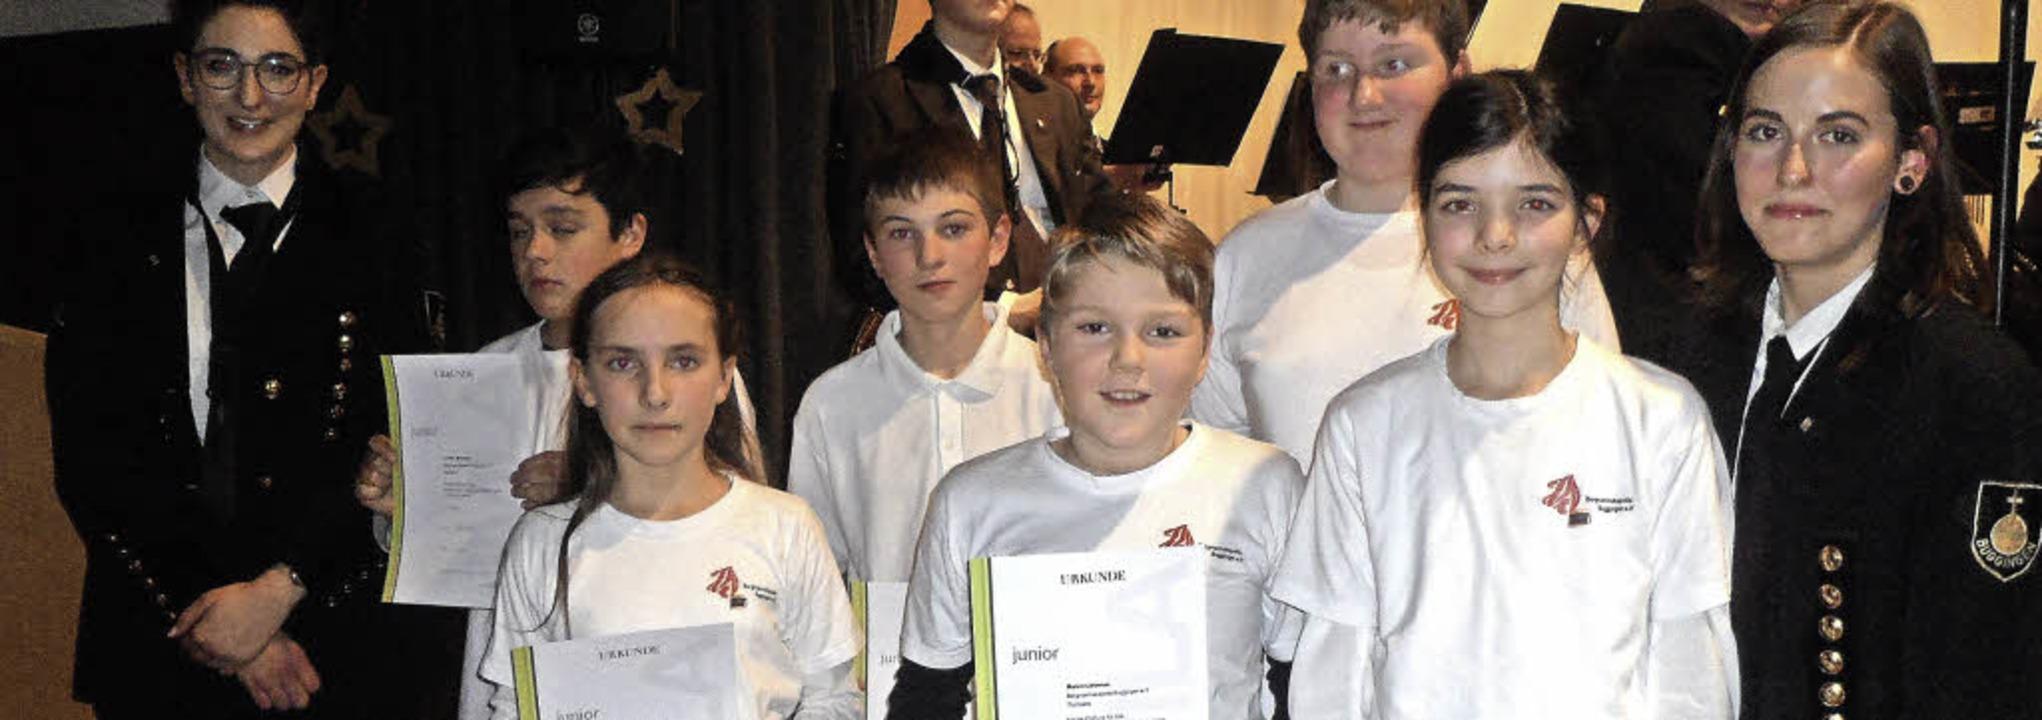 Strahlende Gesichter  (von links): Lui...r, Désirée Dinser (Jugendvertreterin)     Foto: Bianca Flier